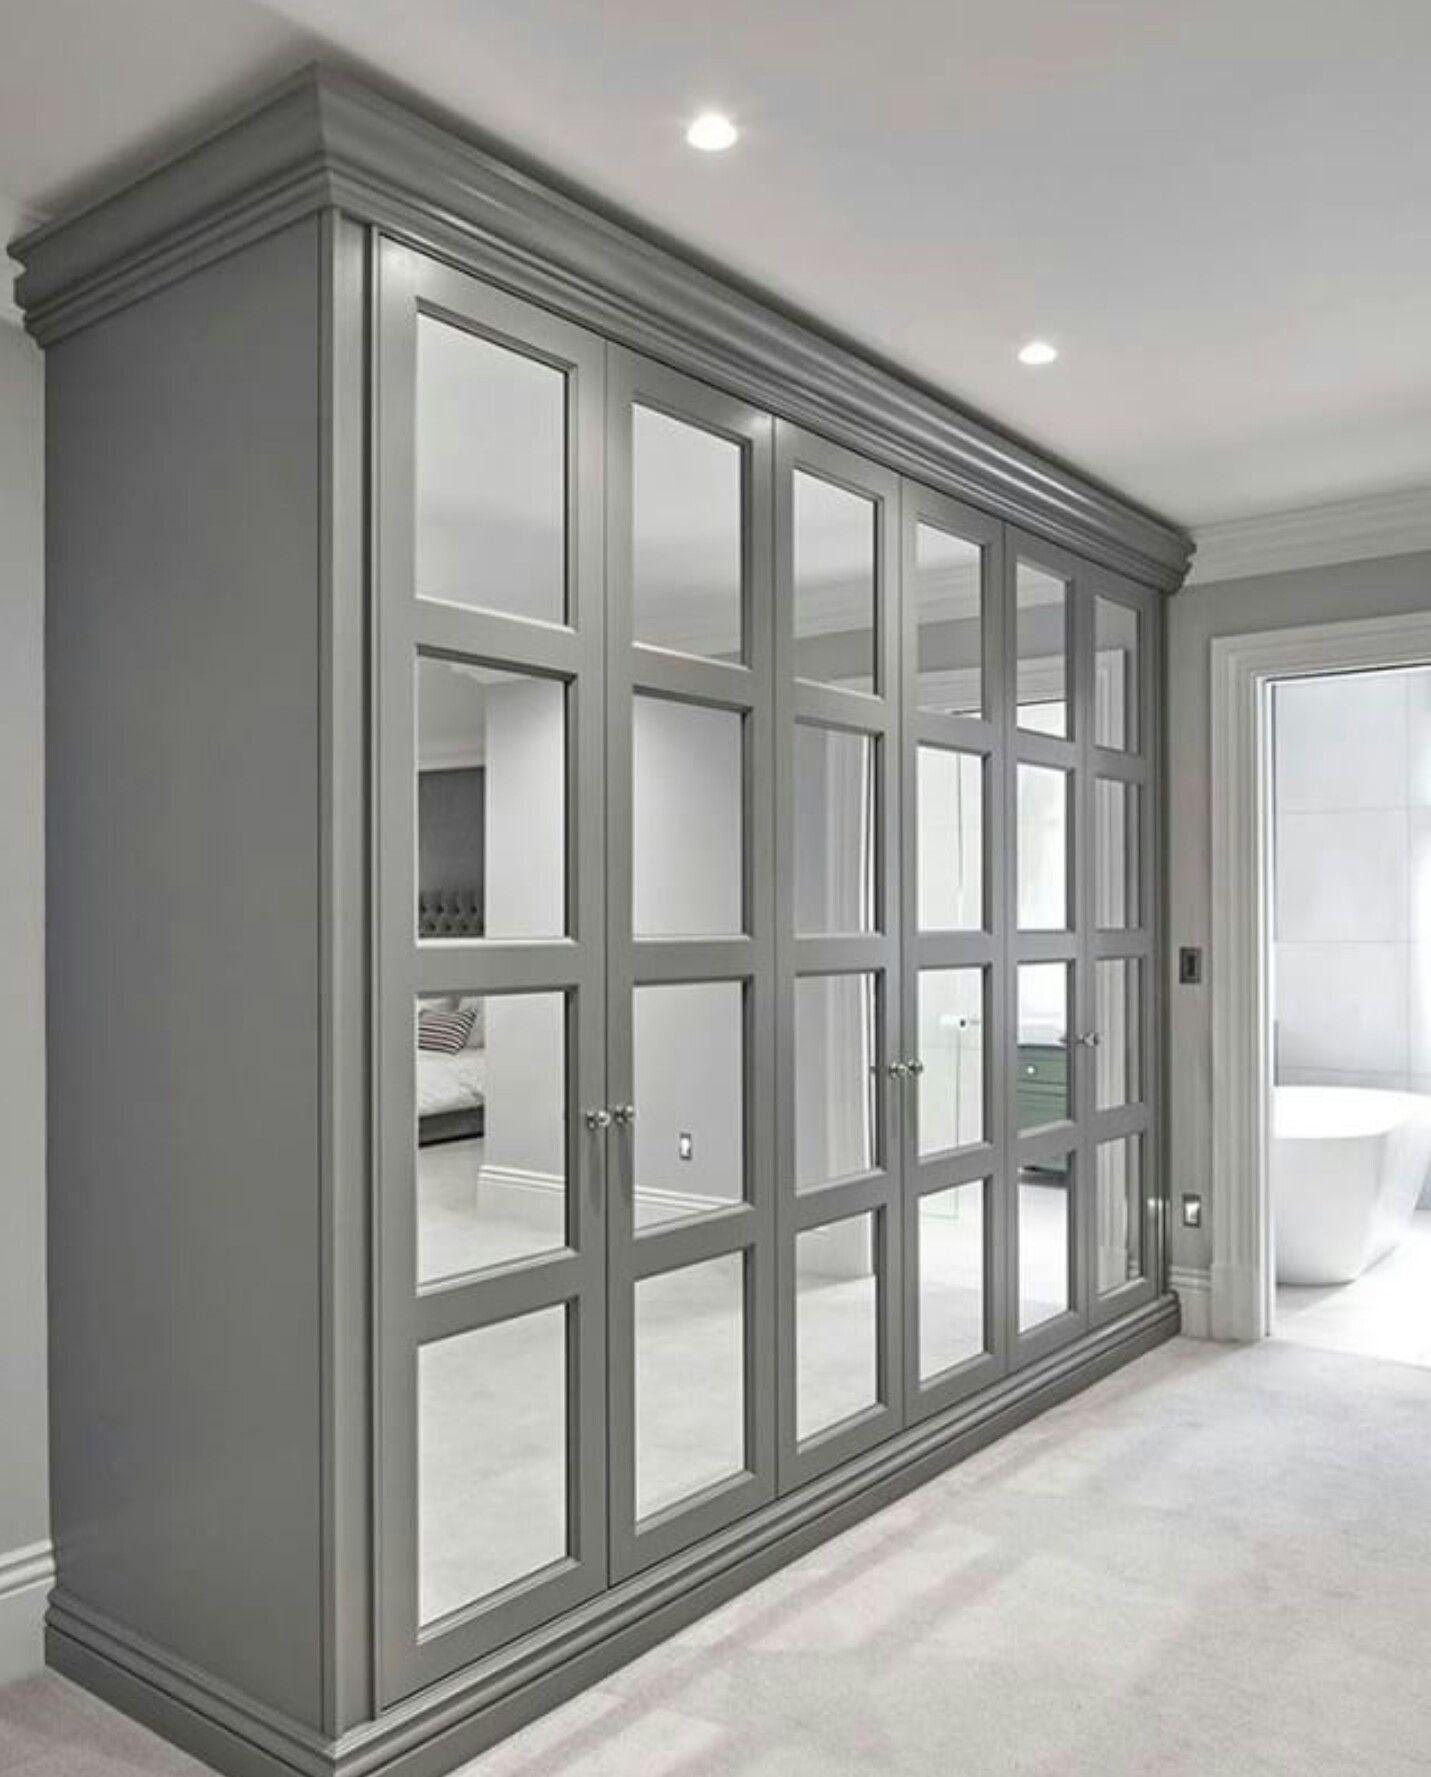 Mirrored Wardrobe Solves 2 Problems More Closet Full Length Mirror Fulham London